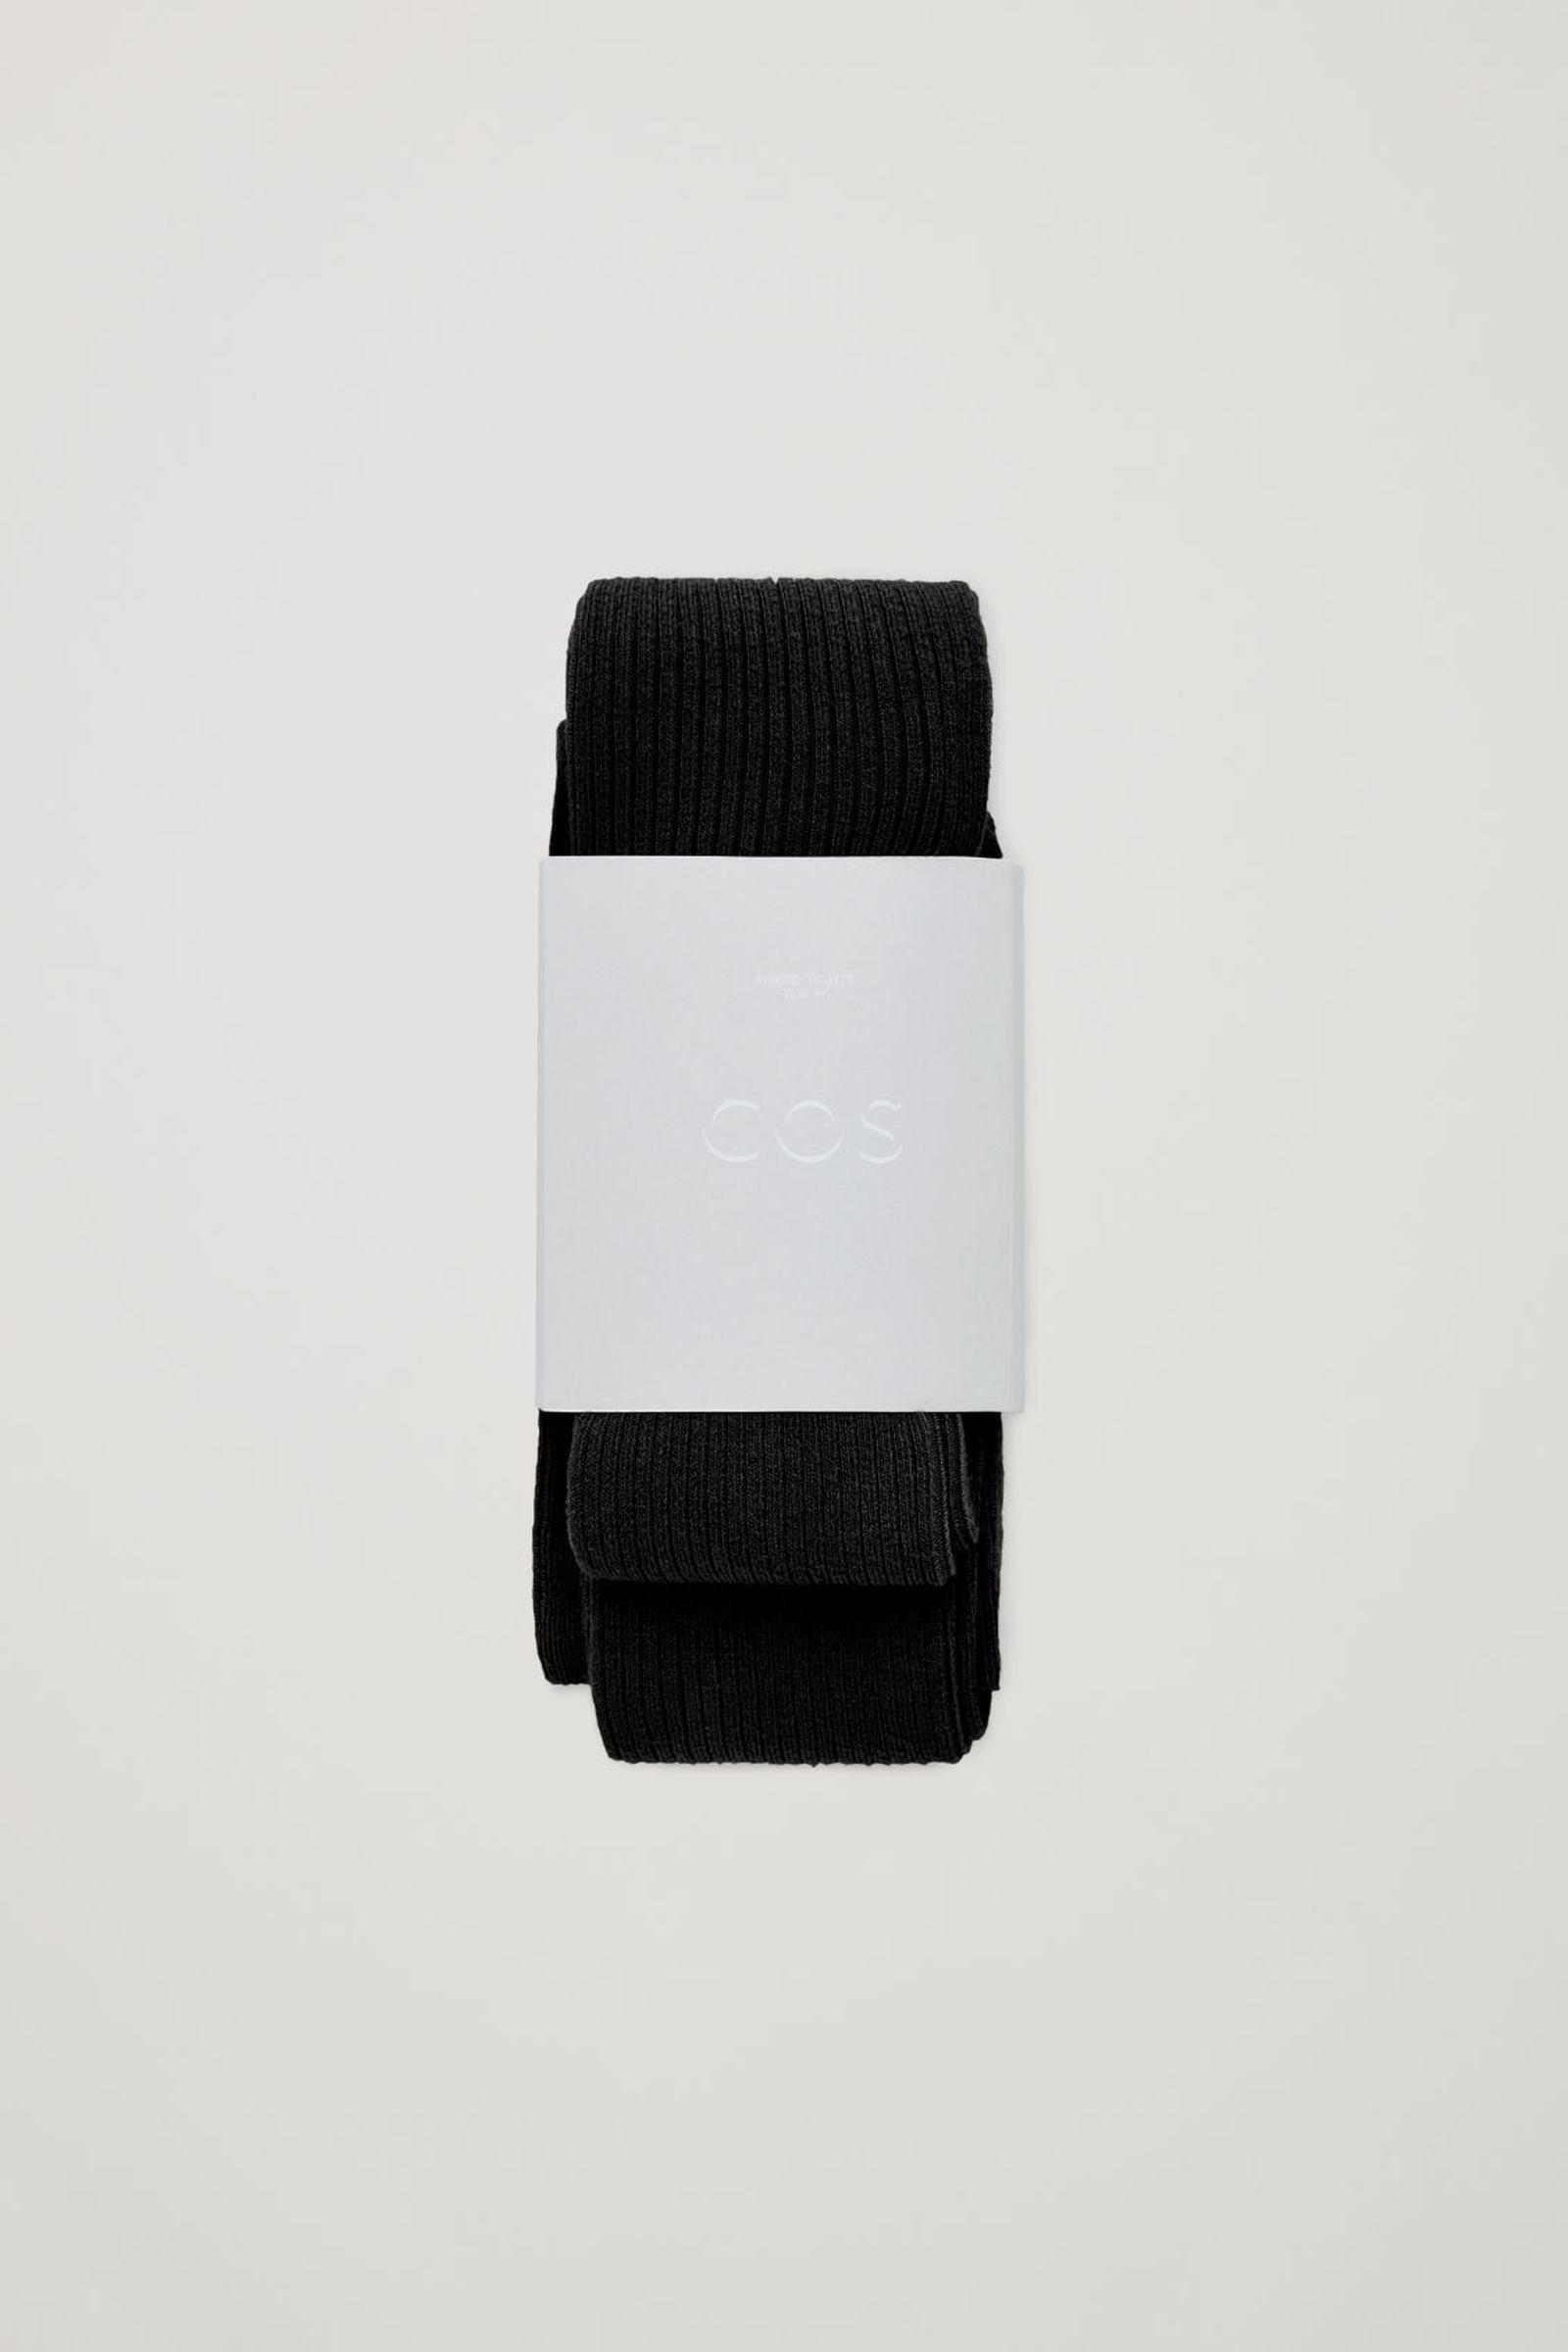 COS 리브드 타이츠의 블랙컬러 Product입니다.